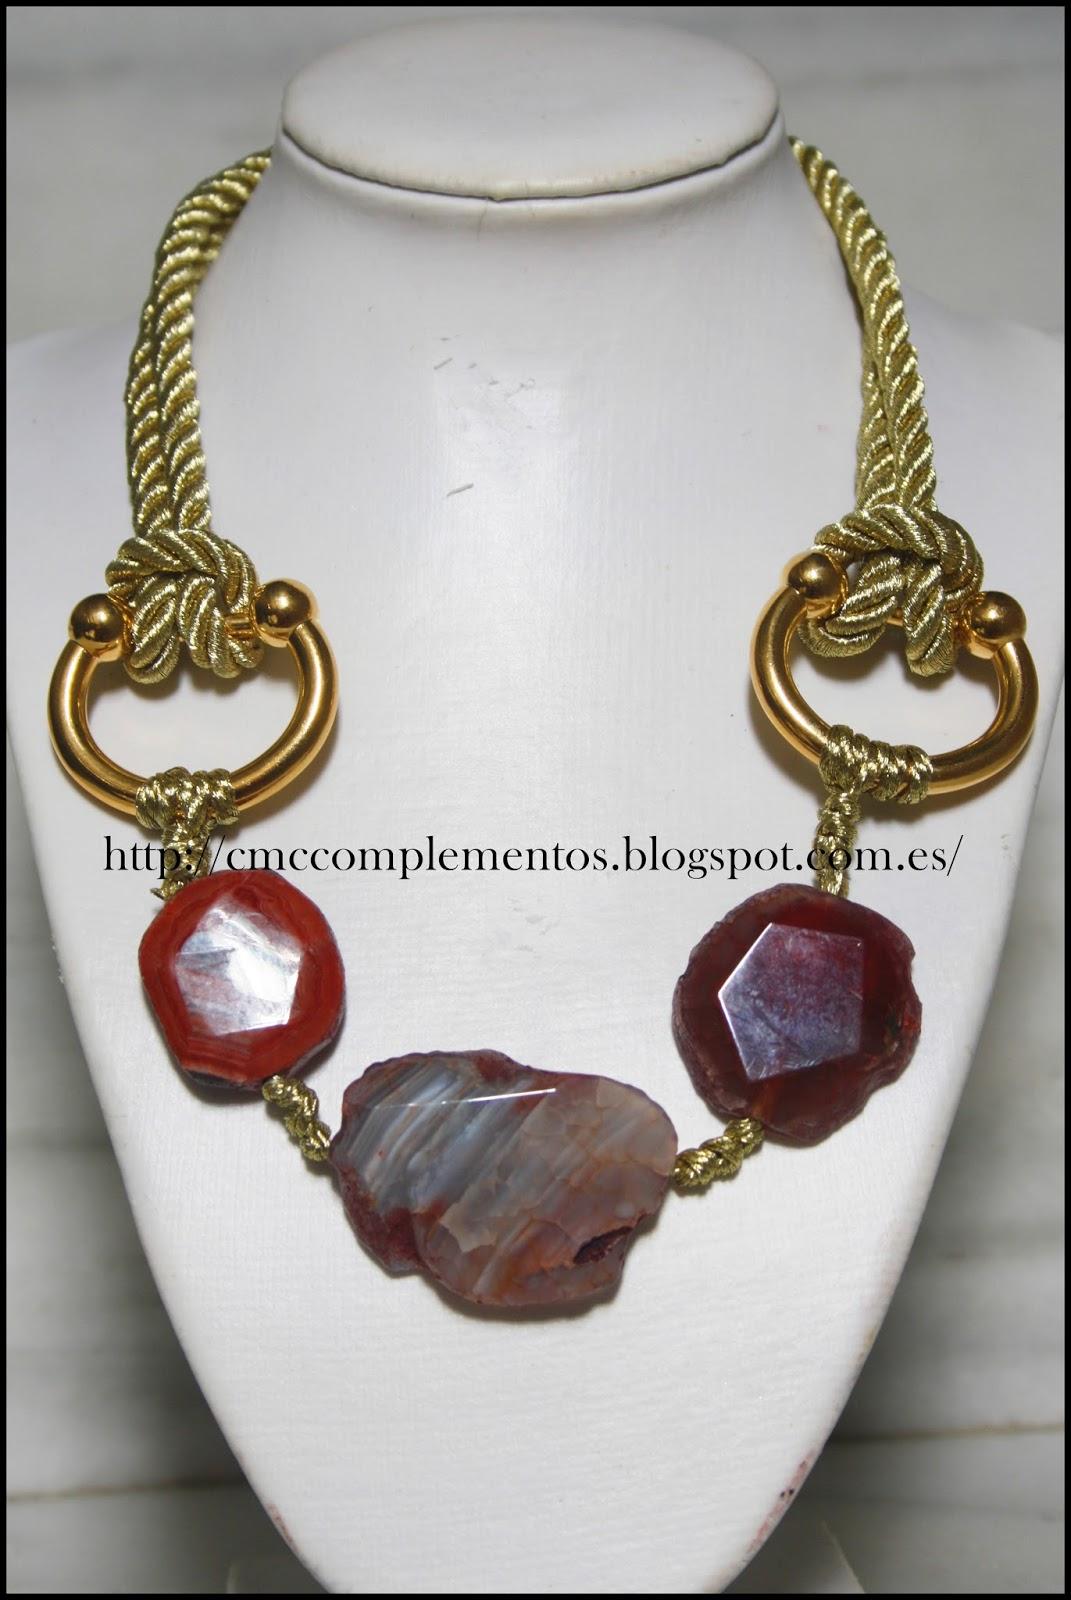 Cmc complementos collar 3 piedras naturales - Piedras para collares ...